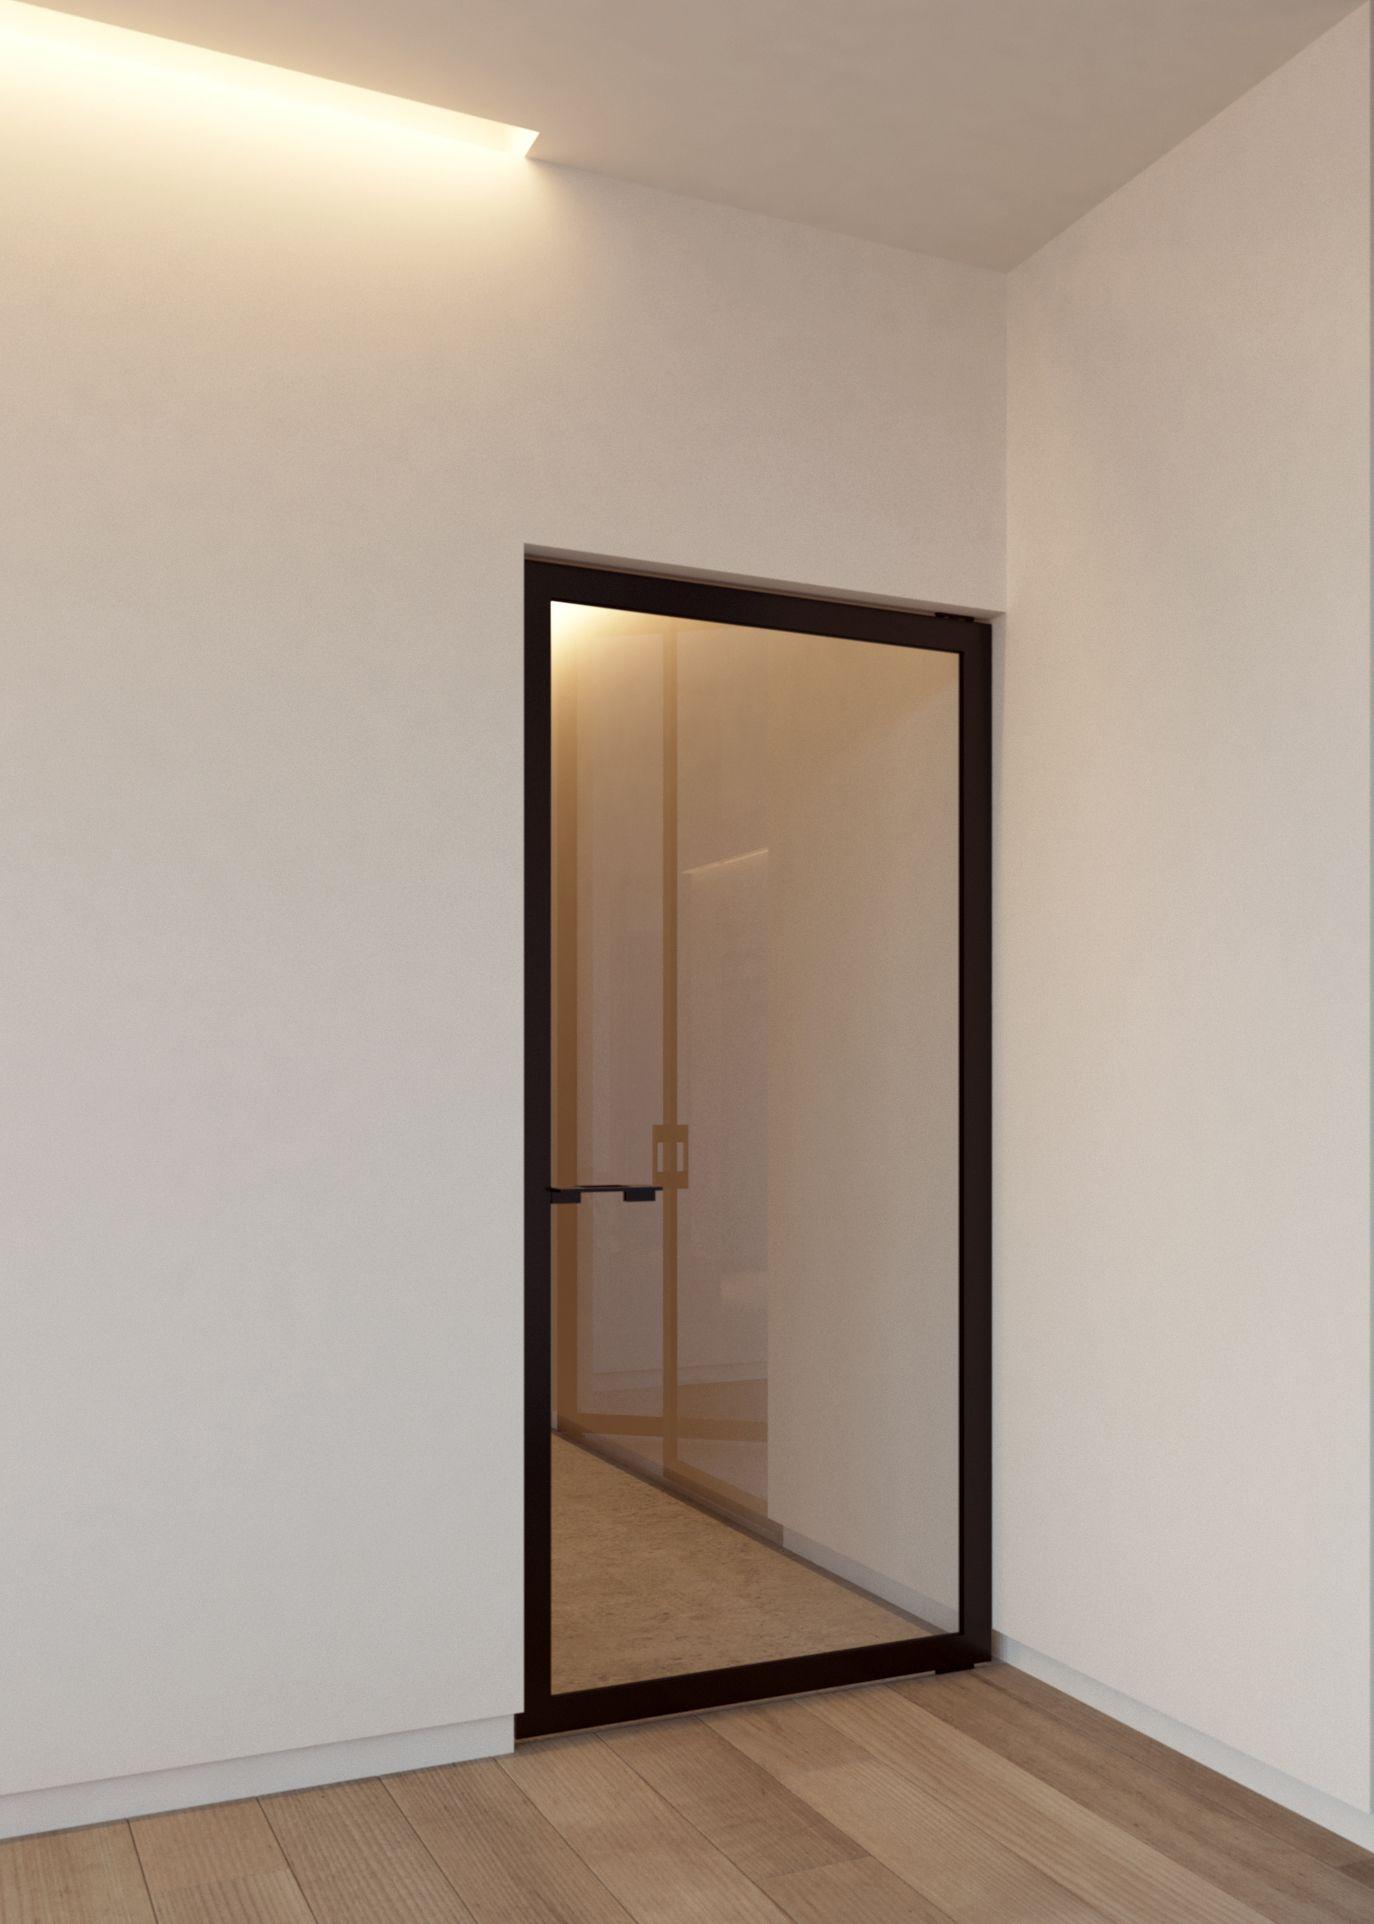 Steel Look Pivot Door With Custom Made Black Anodized